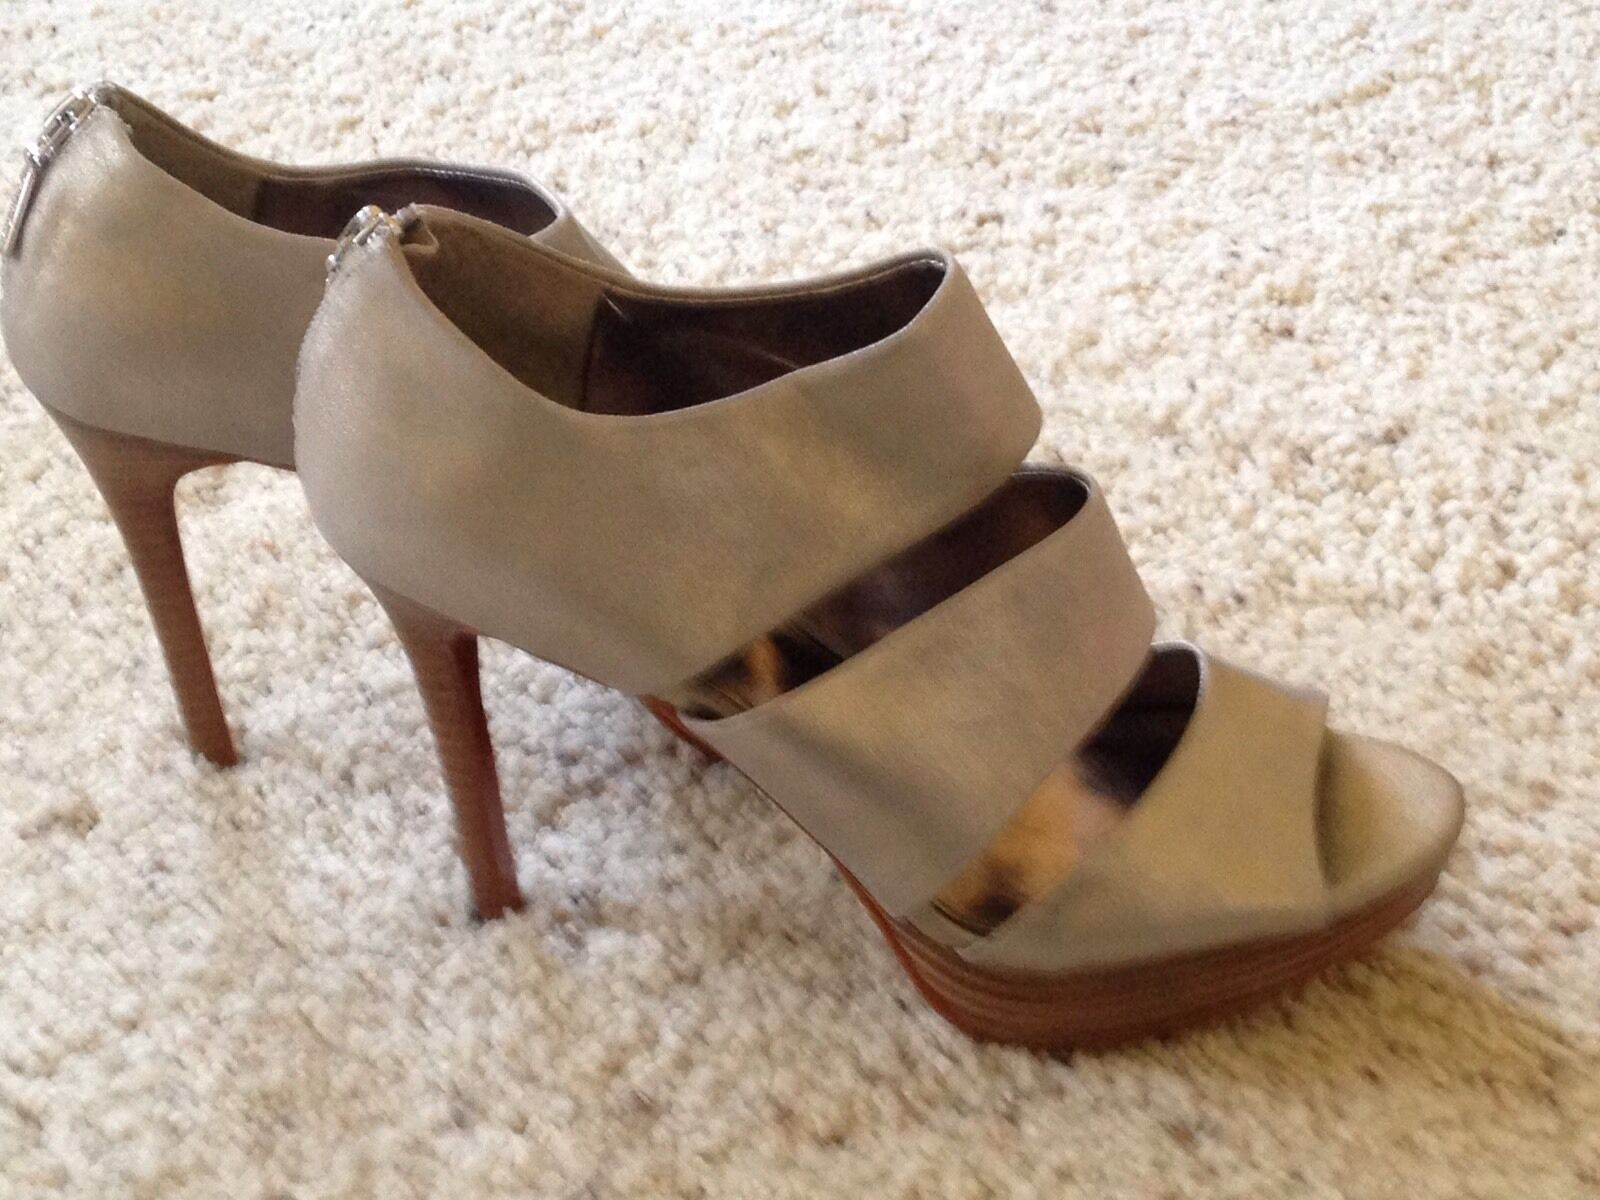 Calvin Klein  Beutiful Heels, Gray color, Size 10